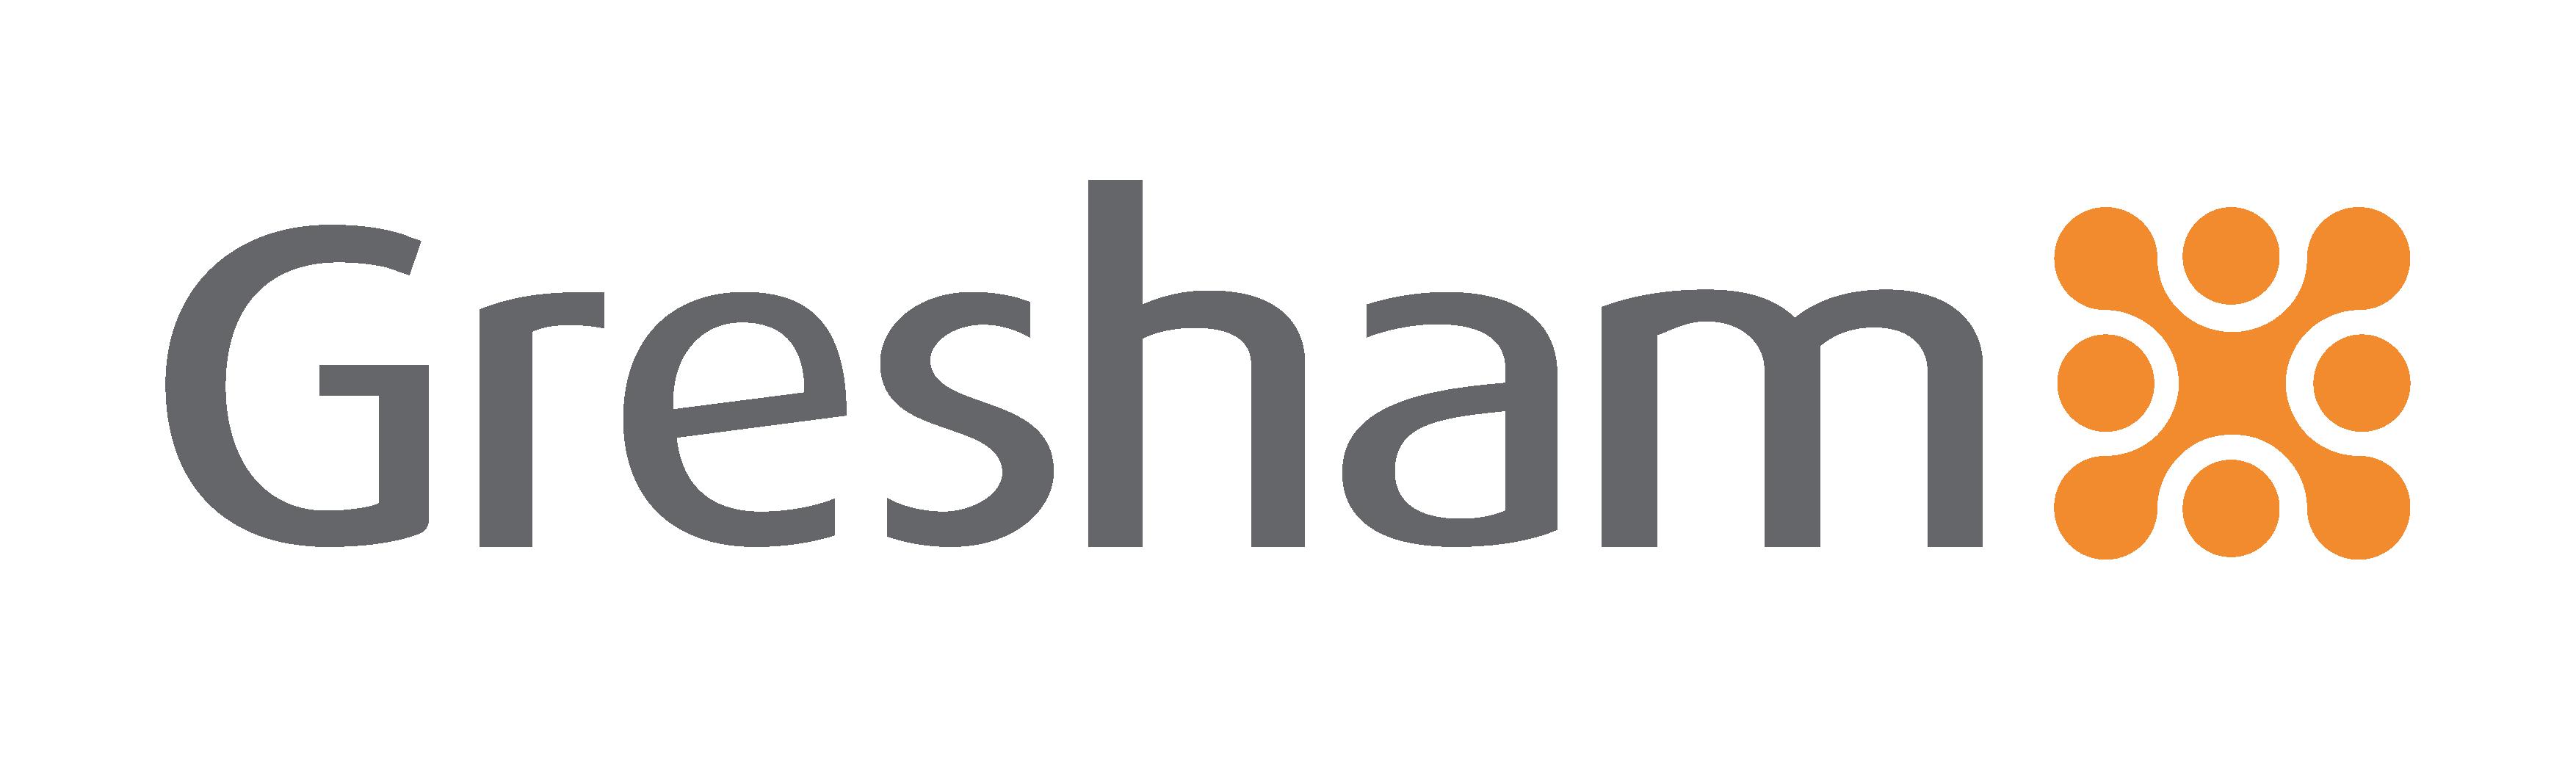 Gresham Makes New Senior Appointments in New York